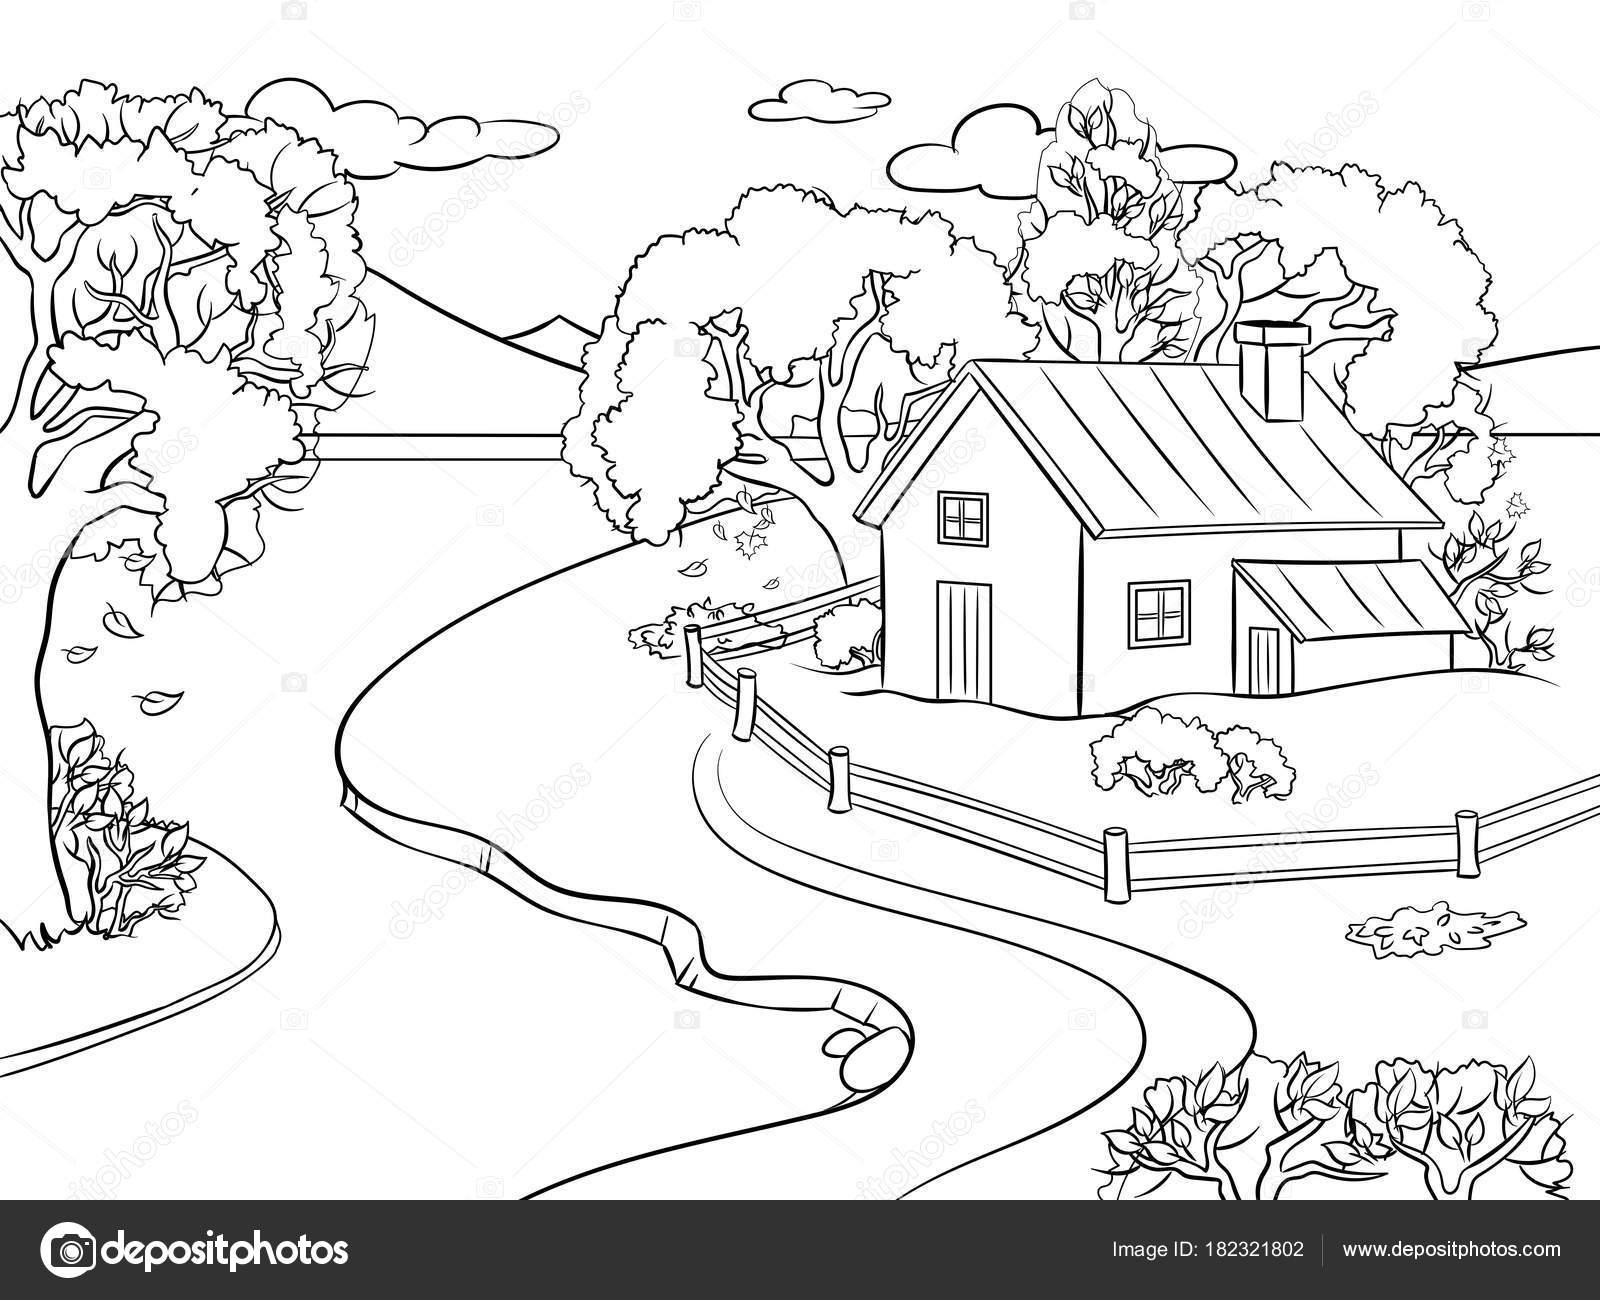 Imágenes Paisajes De Otoño Para Dibujar Paisaje De Otoño Para